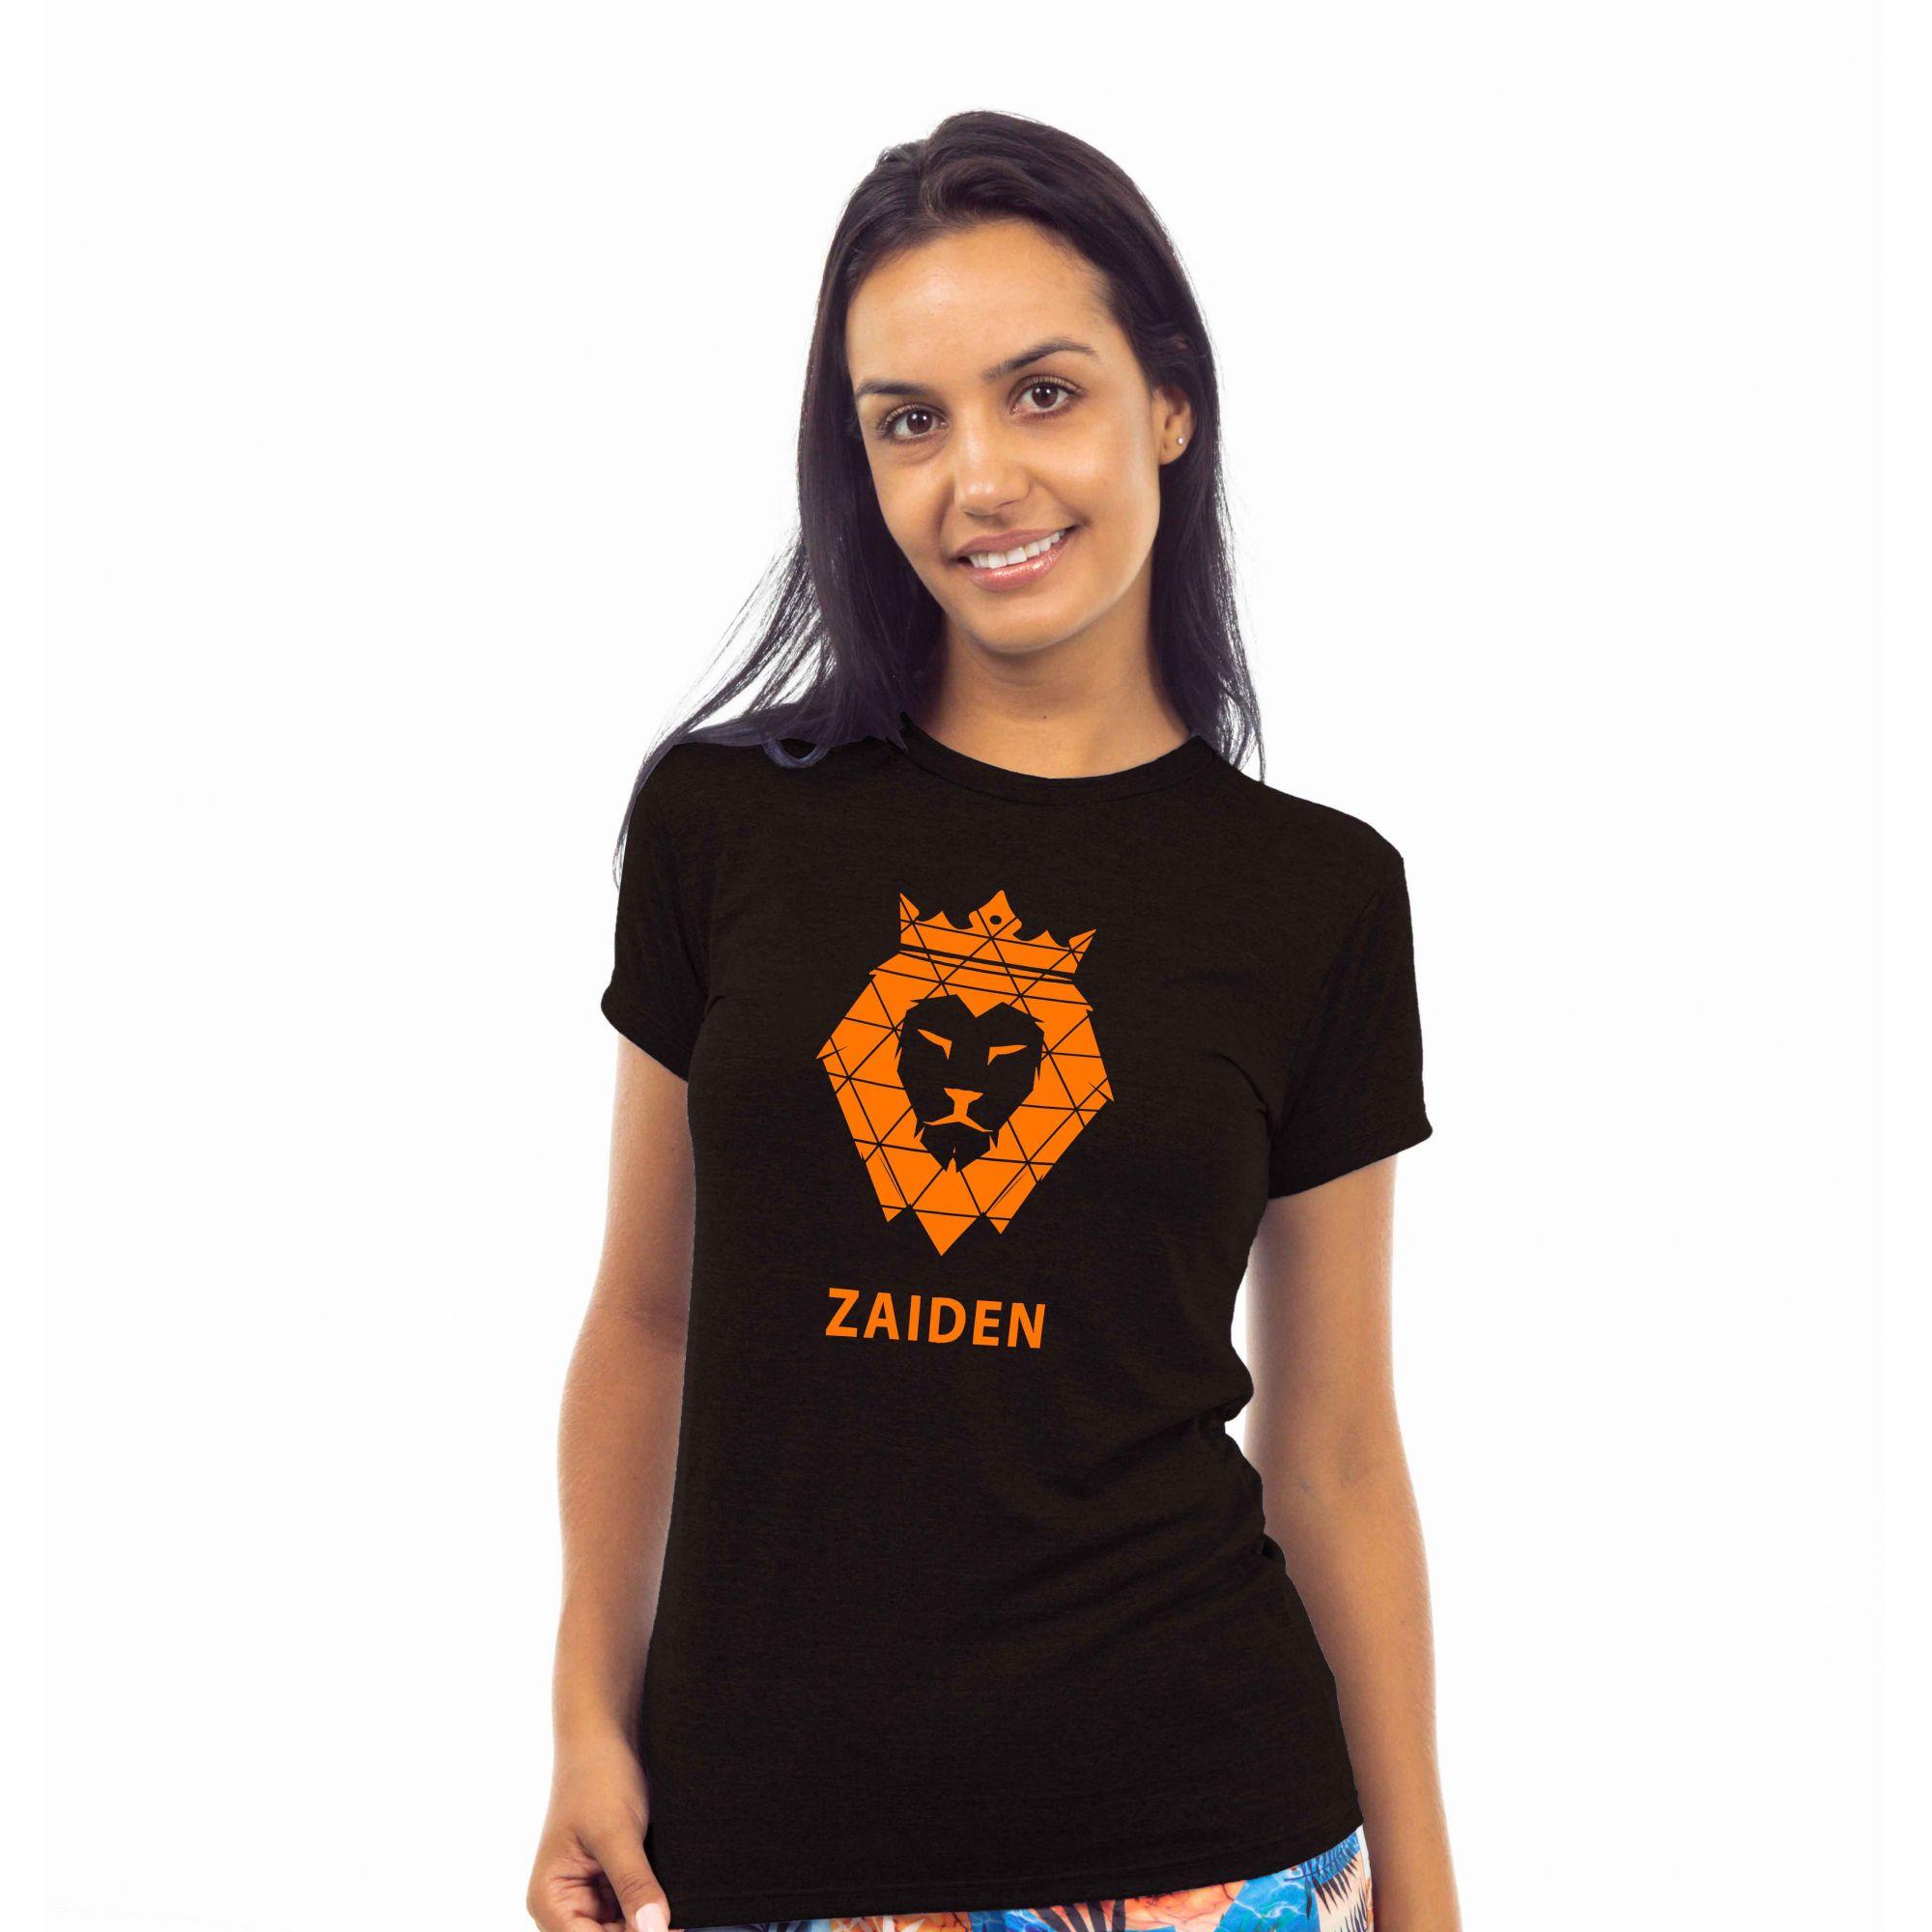 Camiseta Feminina Poliamida ZAIDEN Preta Leão Laranja